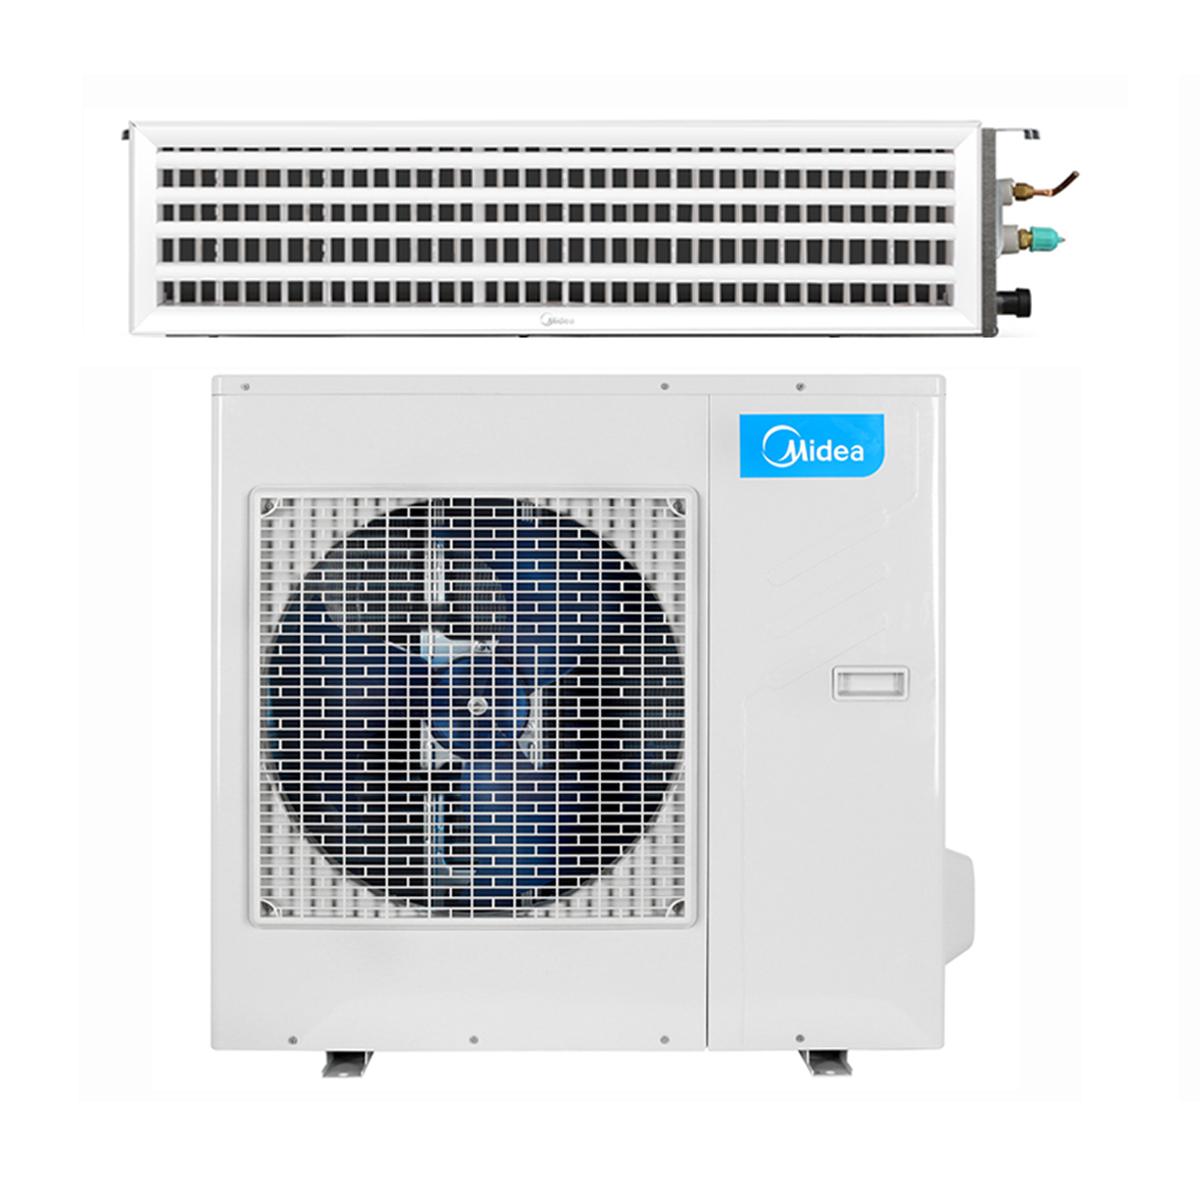 Midea/美的 GRD72T2W-TR风管机套机 说明书.pdf